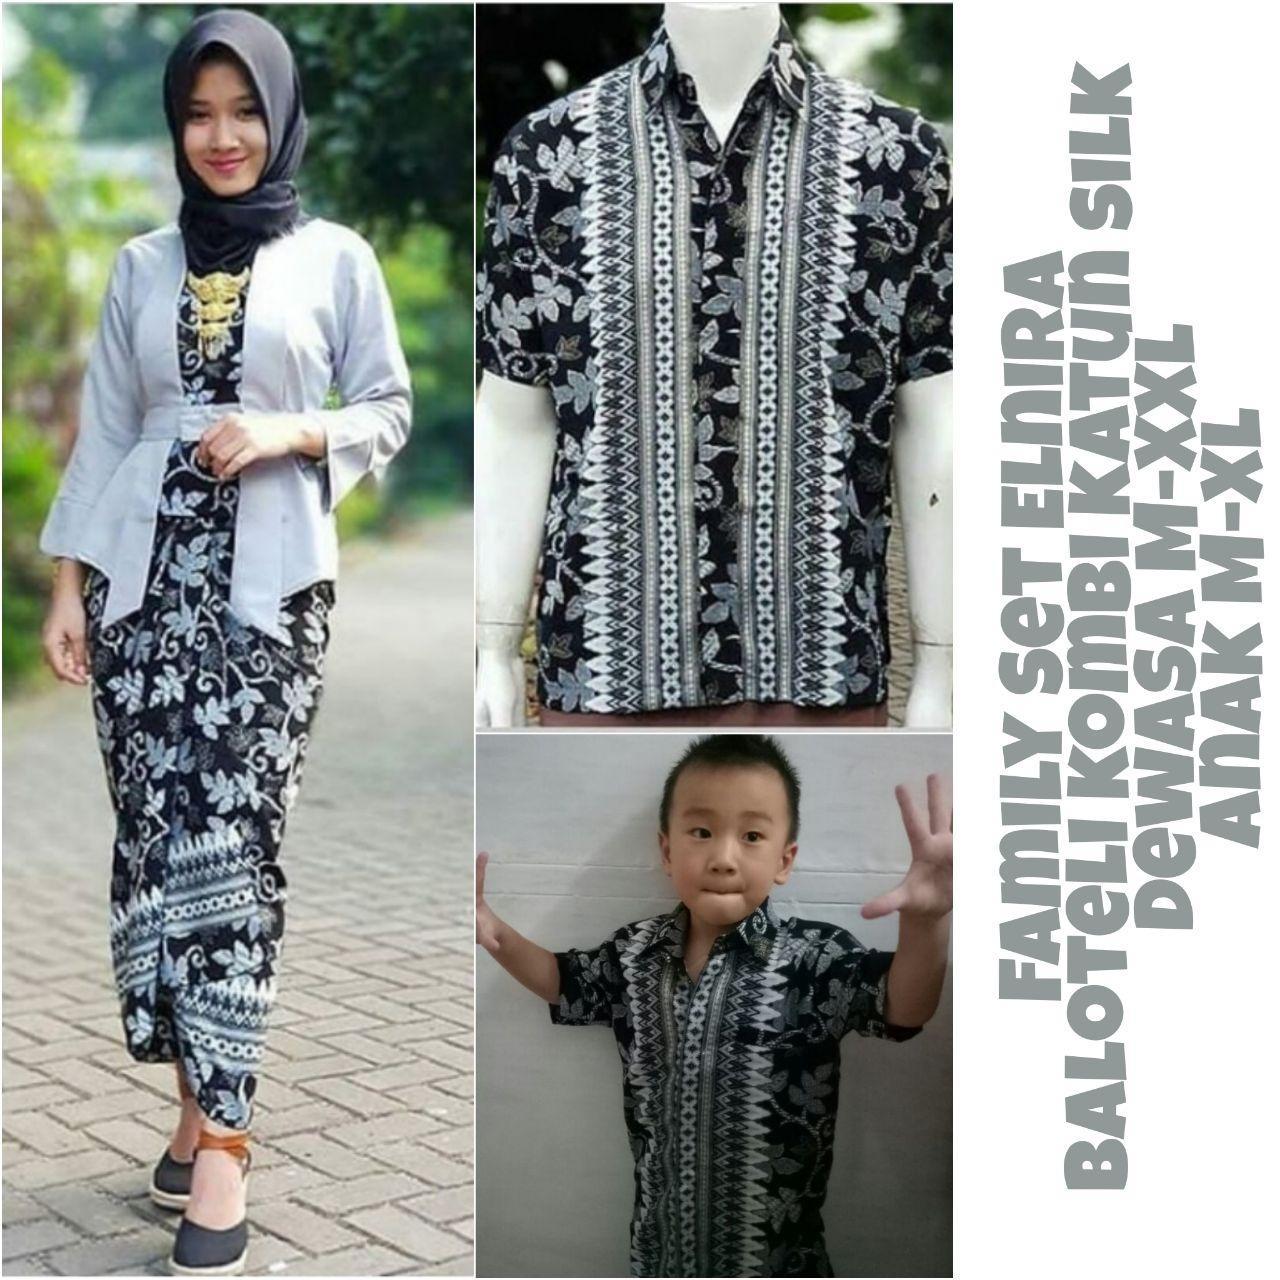 Inilah Harga Batik Anak Perempuan Terbaru 2018 Produk Ukm Bumn Set Dress Rajut Ungu Miracle Couple Family Viiv Kebaya Blouse Dan Kemeja Ayah